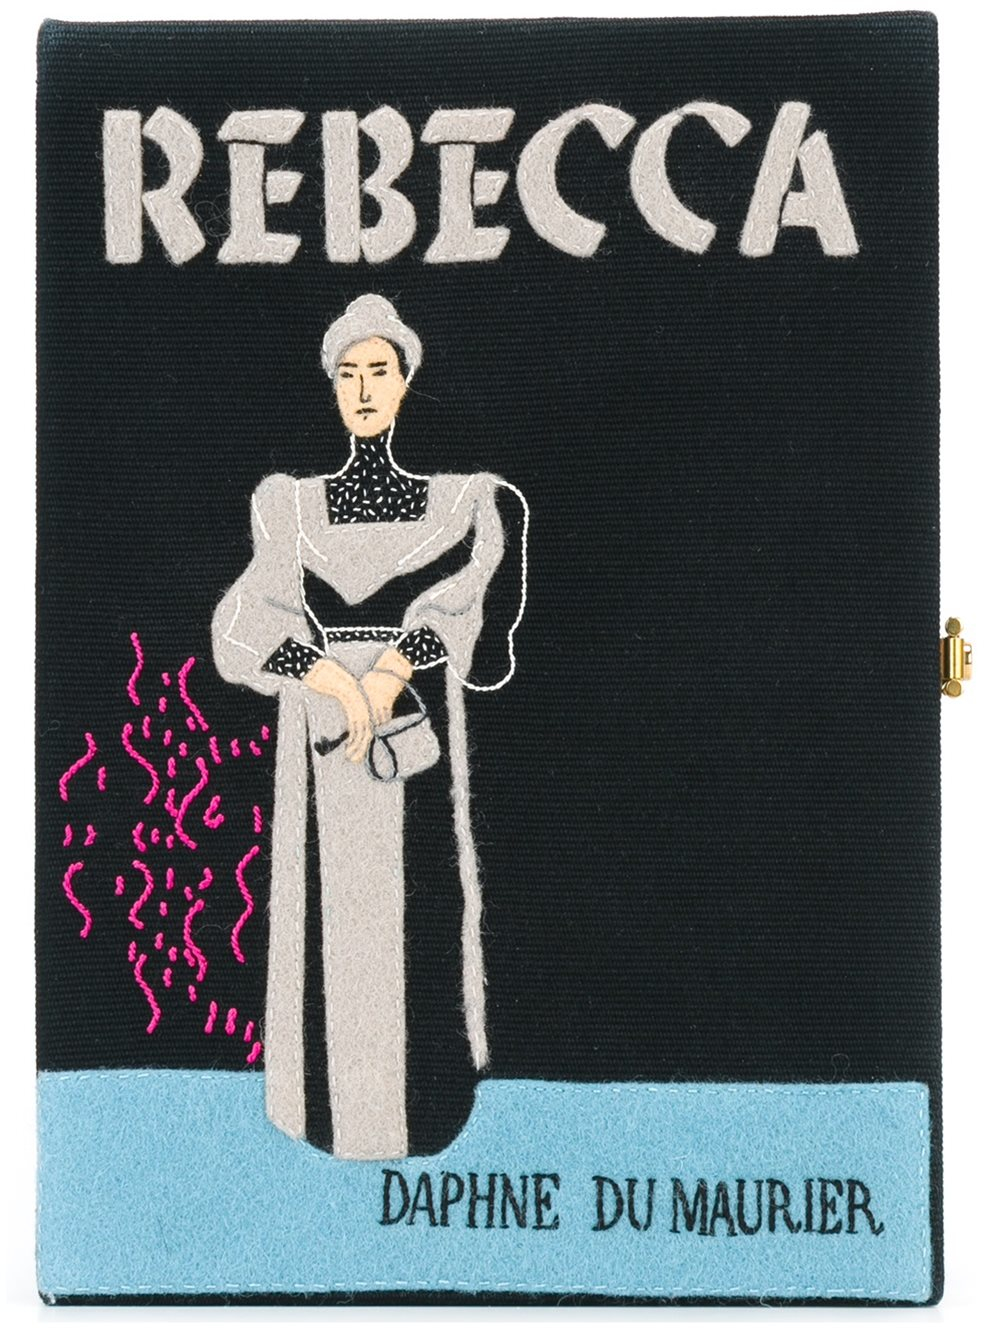 Book Cover Black Uk : Olympia le tan book cover clutch in black lyst